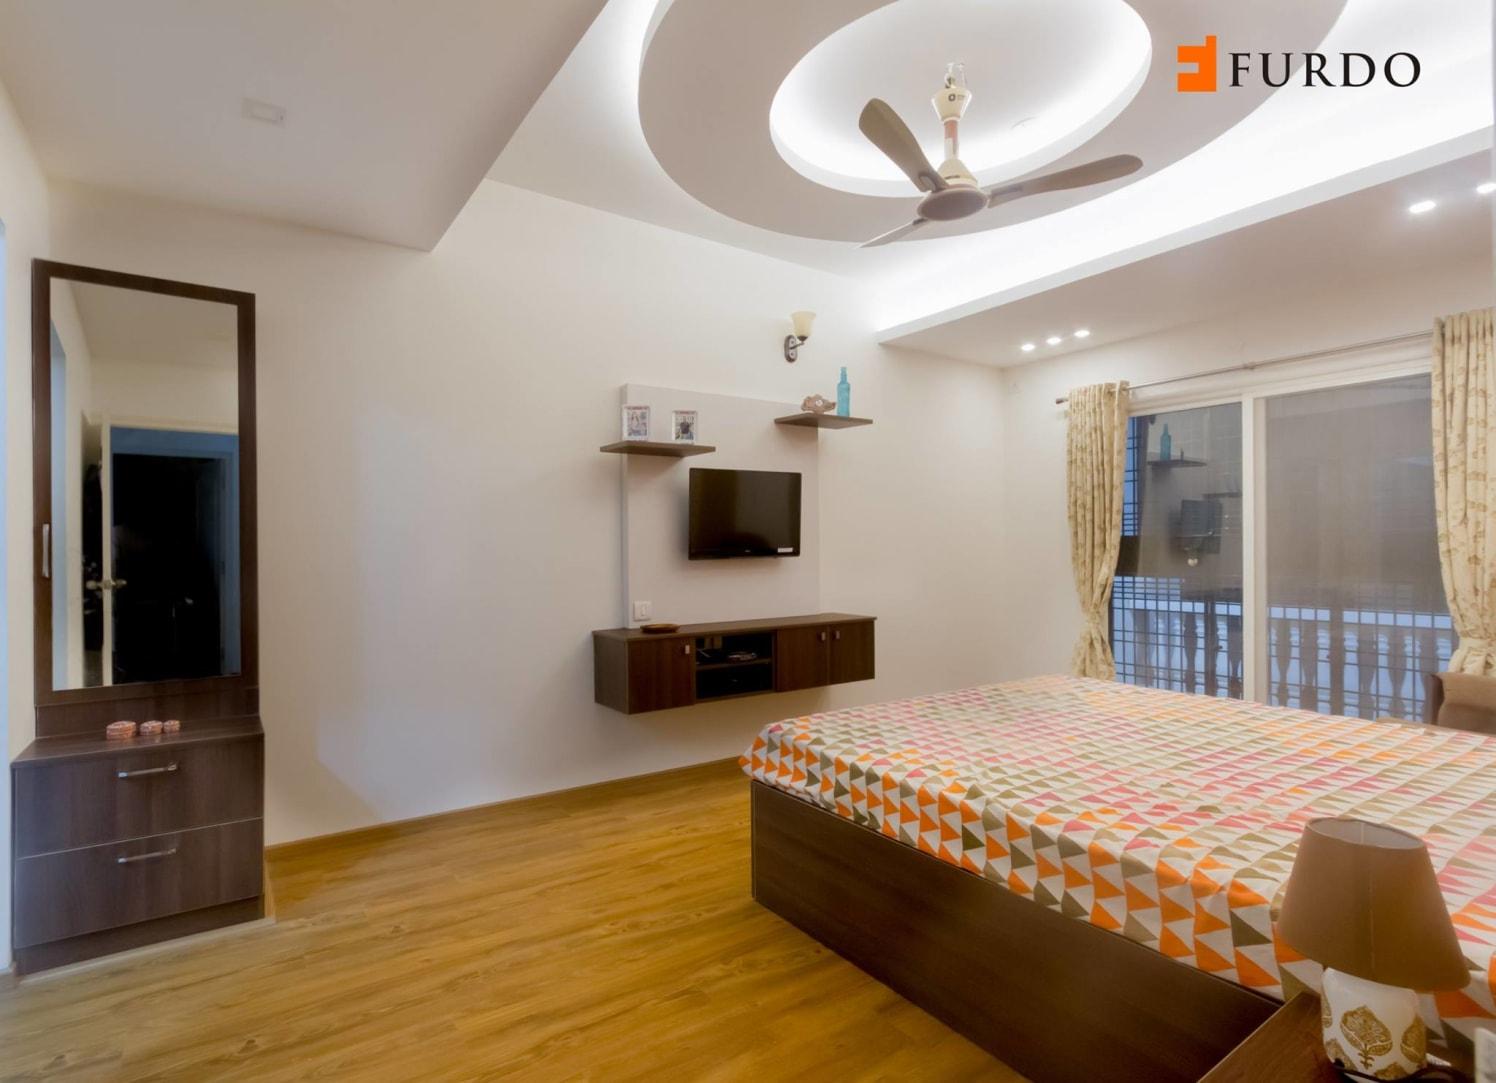 Bedroom With Wooden Flooring And Designer False Ceiling by Furdo.com Bedroom Modern | Interior Design Photos & Ideas